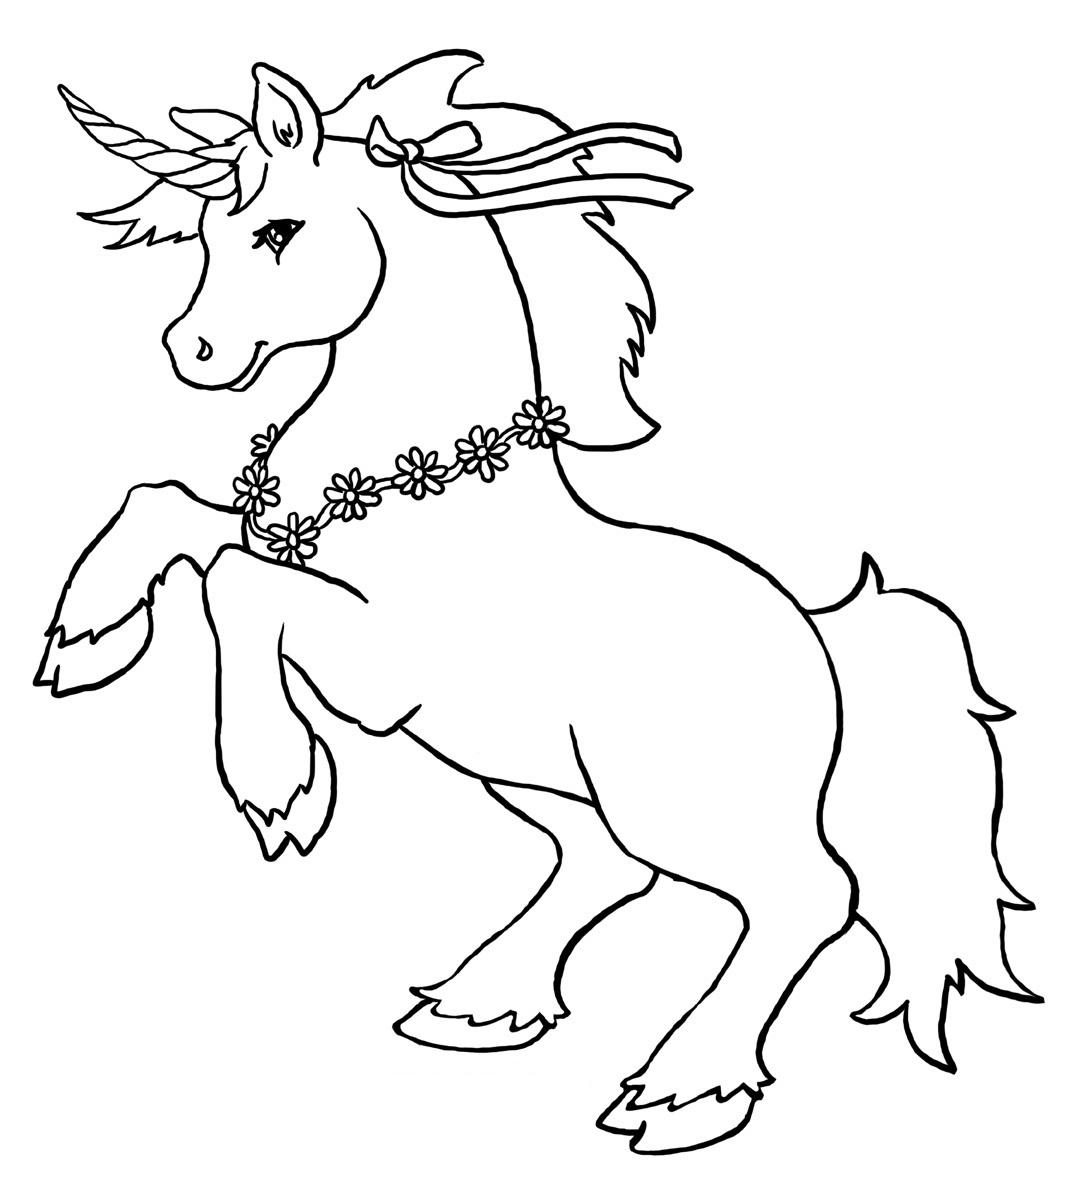 coloring page unicorn top 25 free printable unicorn coloring pages online coloring page unicorn